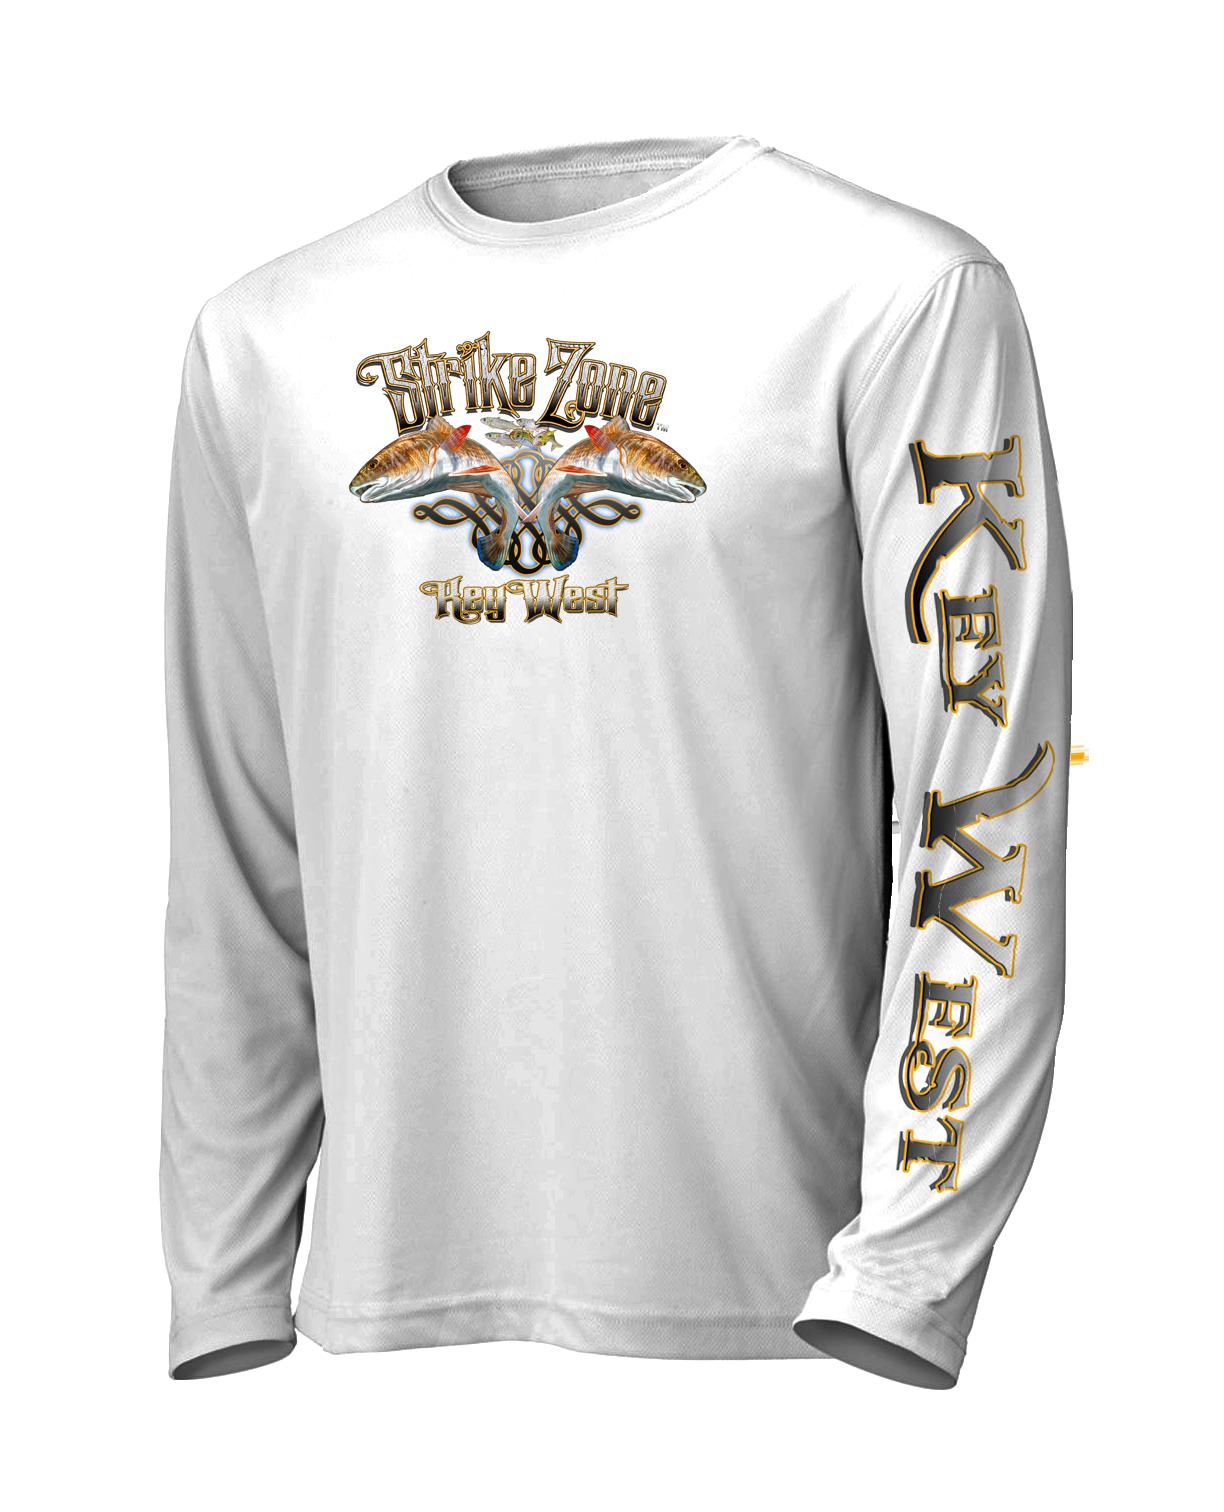 jason-mathias-strike-zone-inshore-slam-fishing-shirt-white-front.png